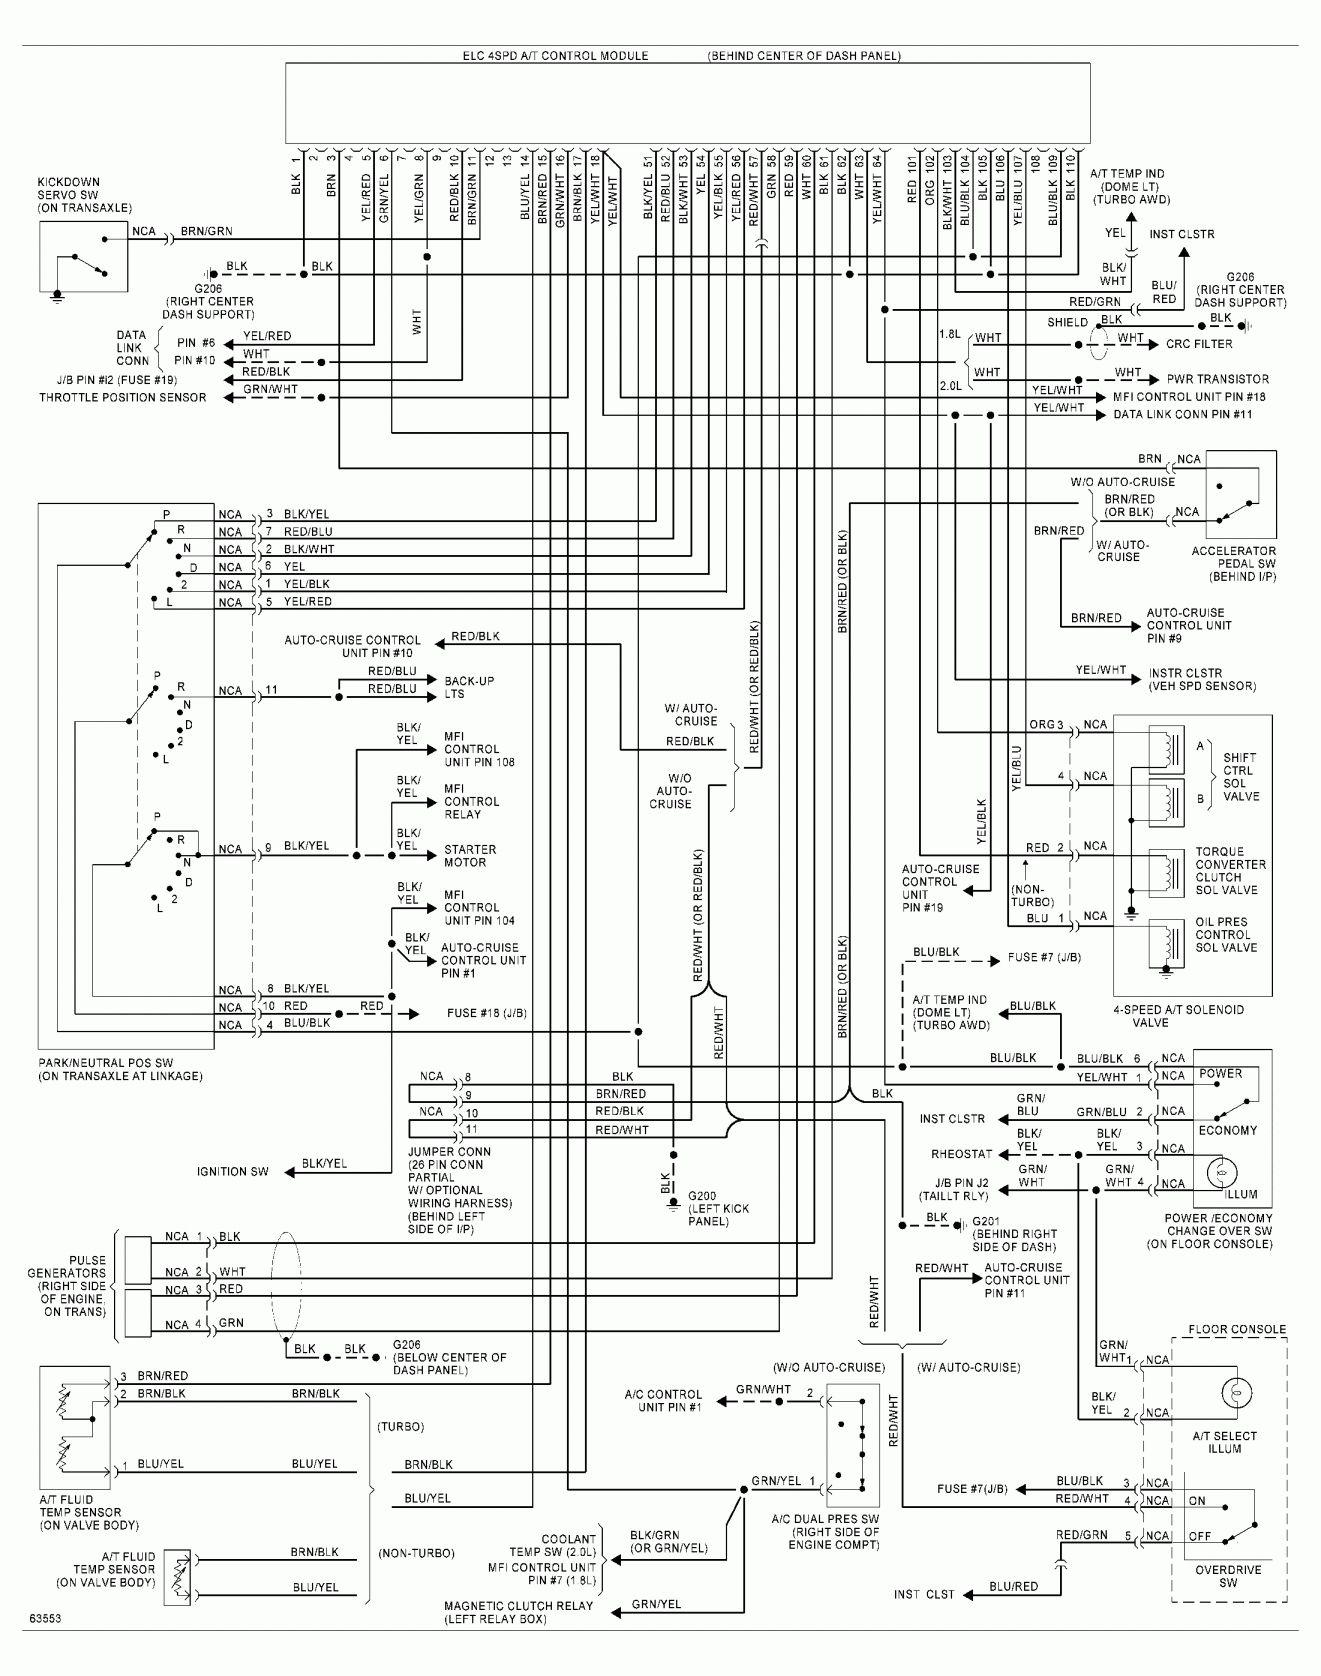 Mitsubishi 4g63 Engine Diagram Wiring Diagrams Datawire Datawire Massimocariello It